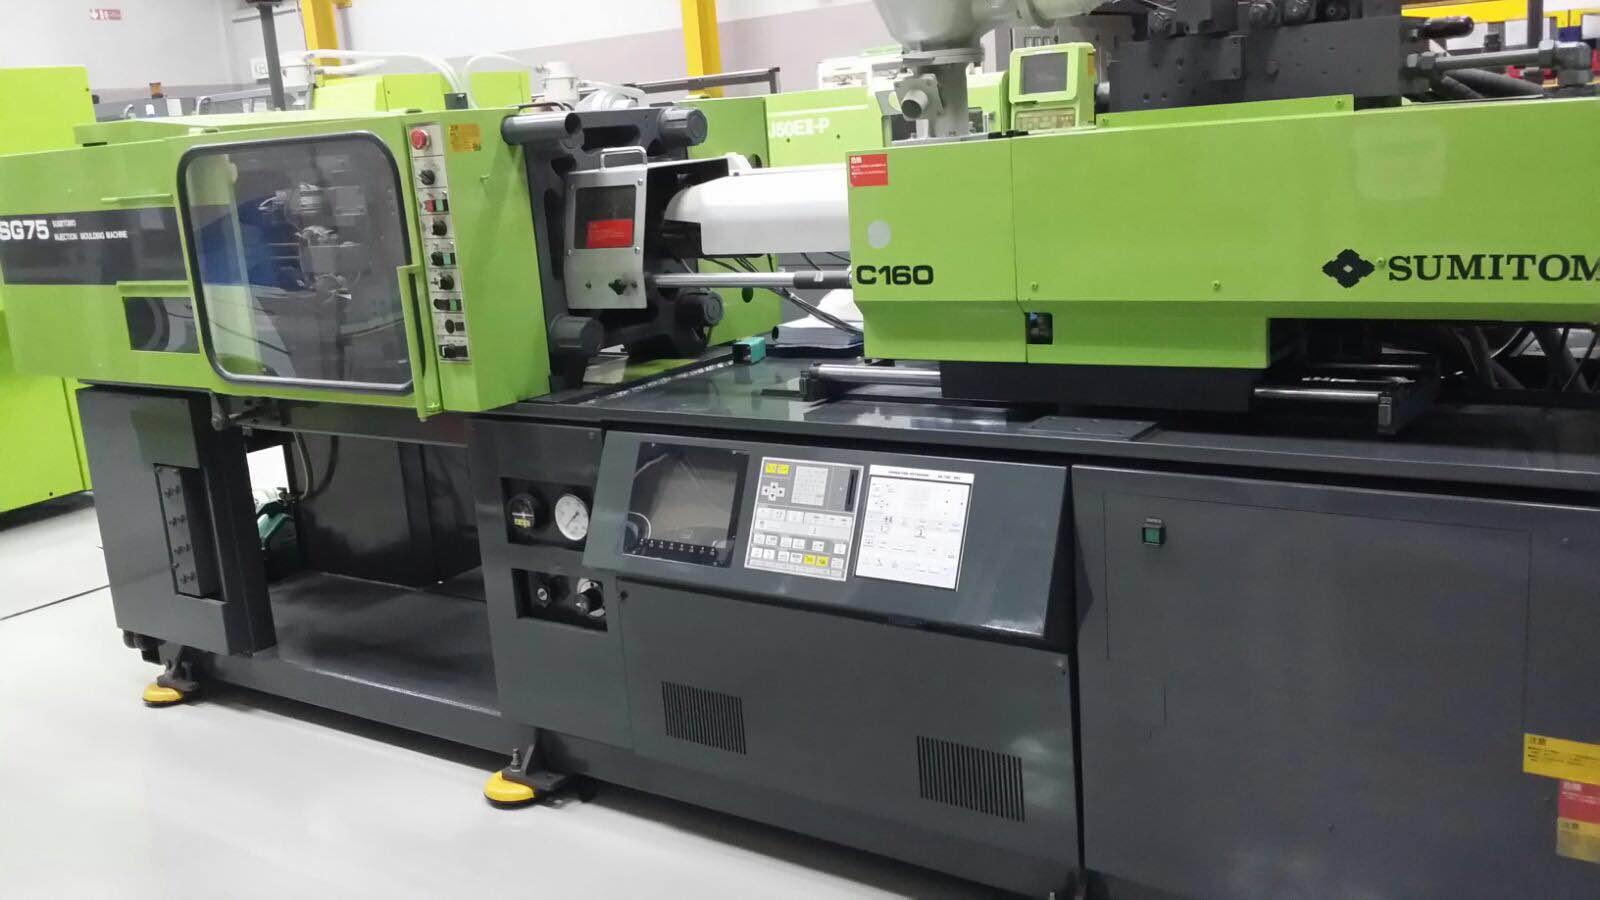 Sumitomo Sg 75h Injection Moulding Machine Exapro